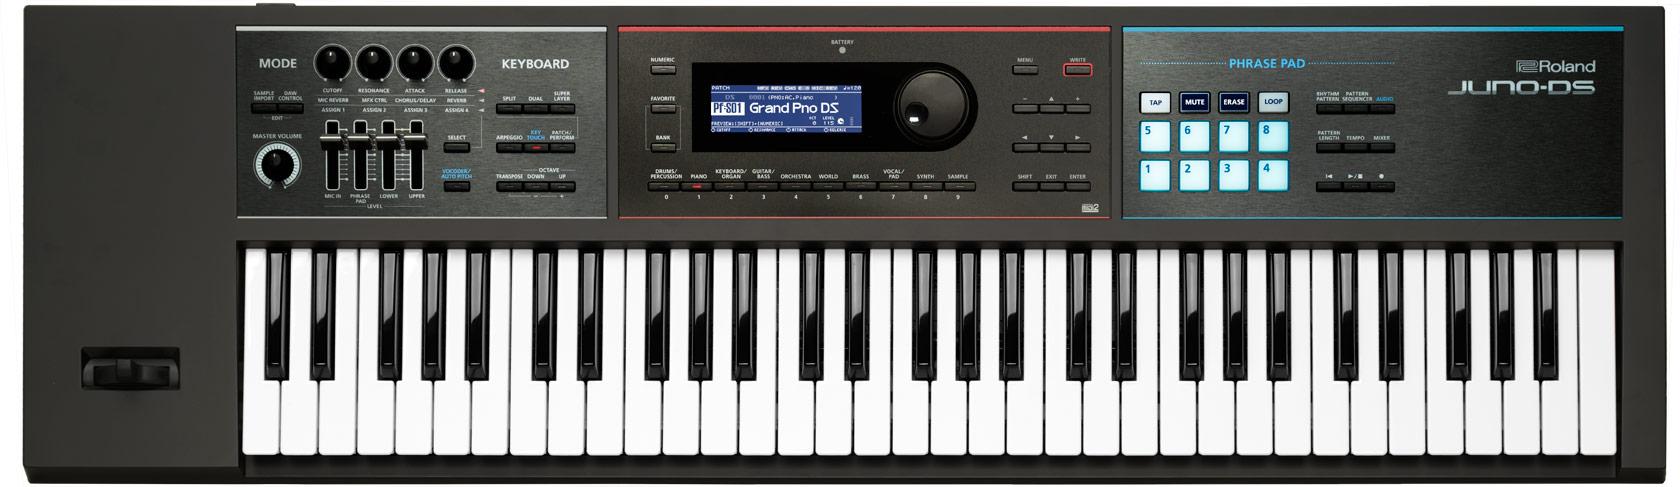 Синтезатор Roland JUNO-DS61: фото